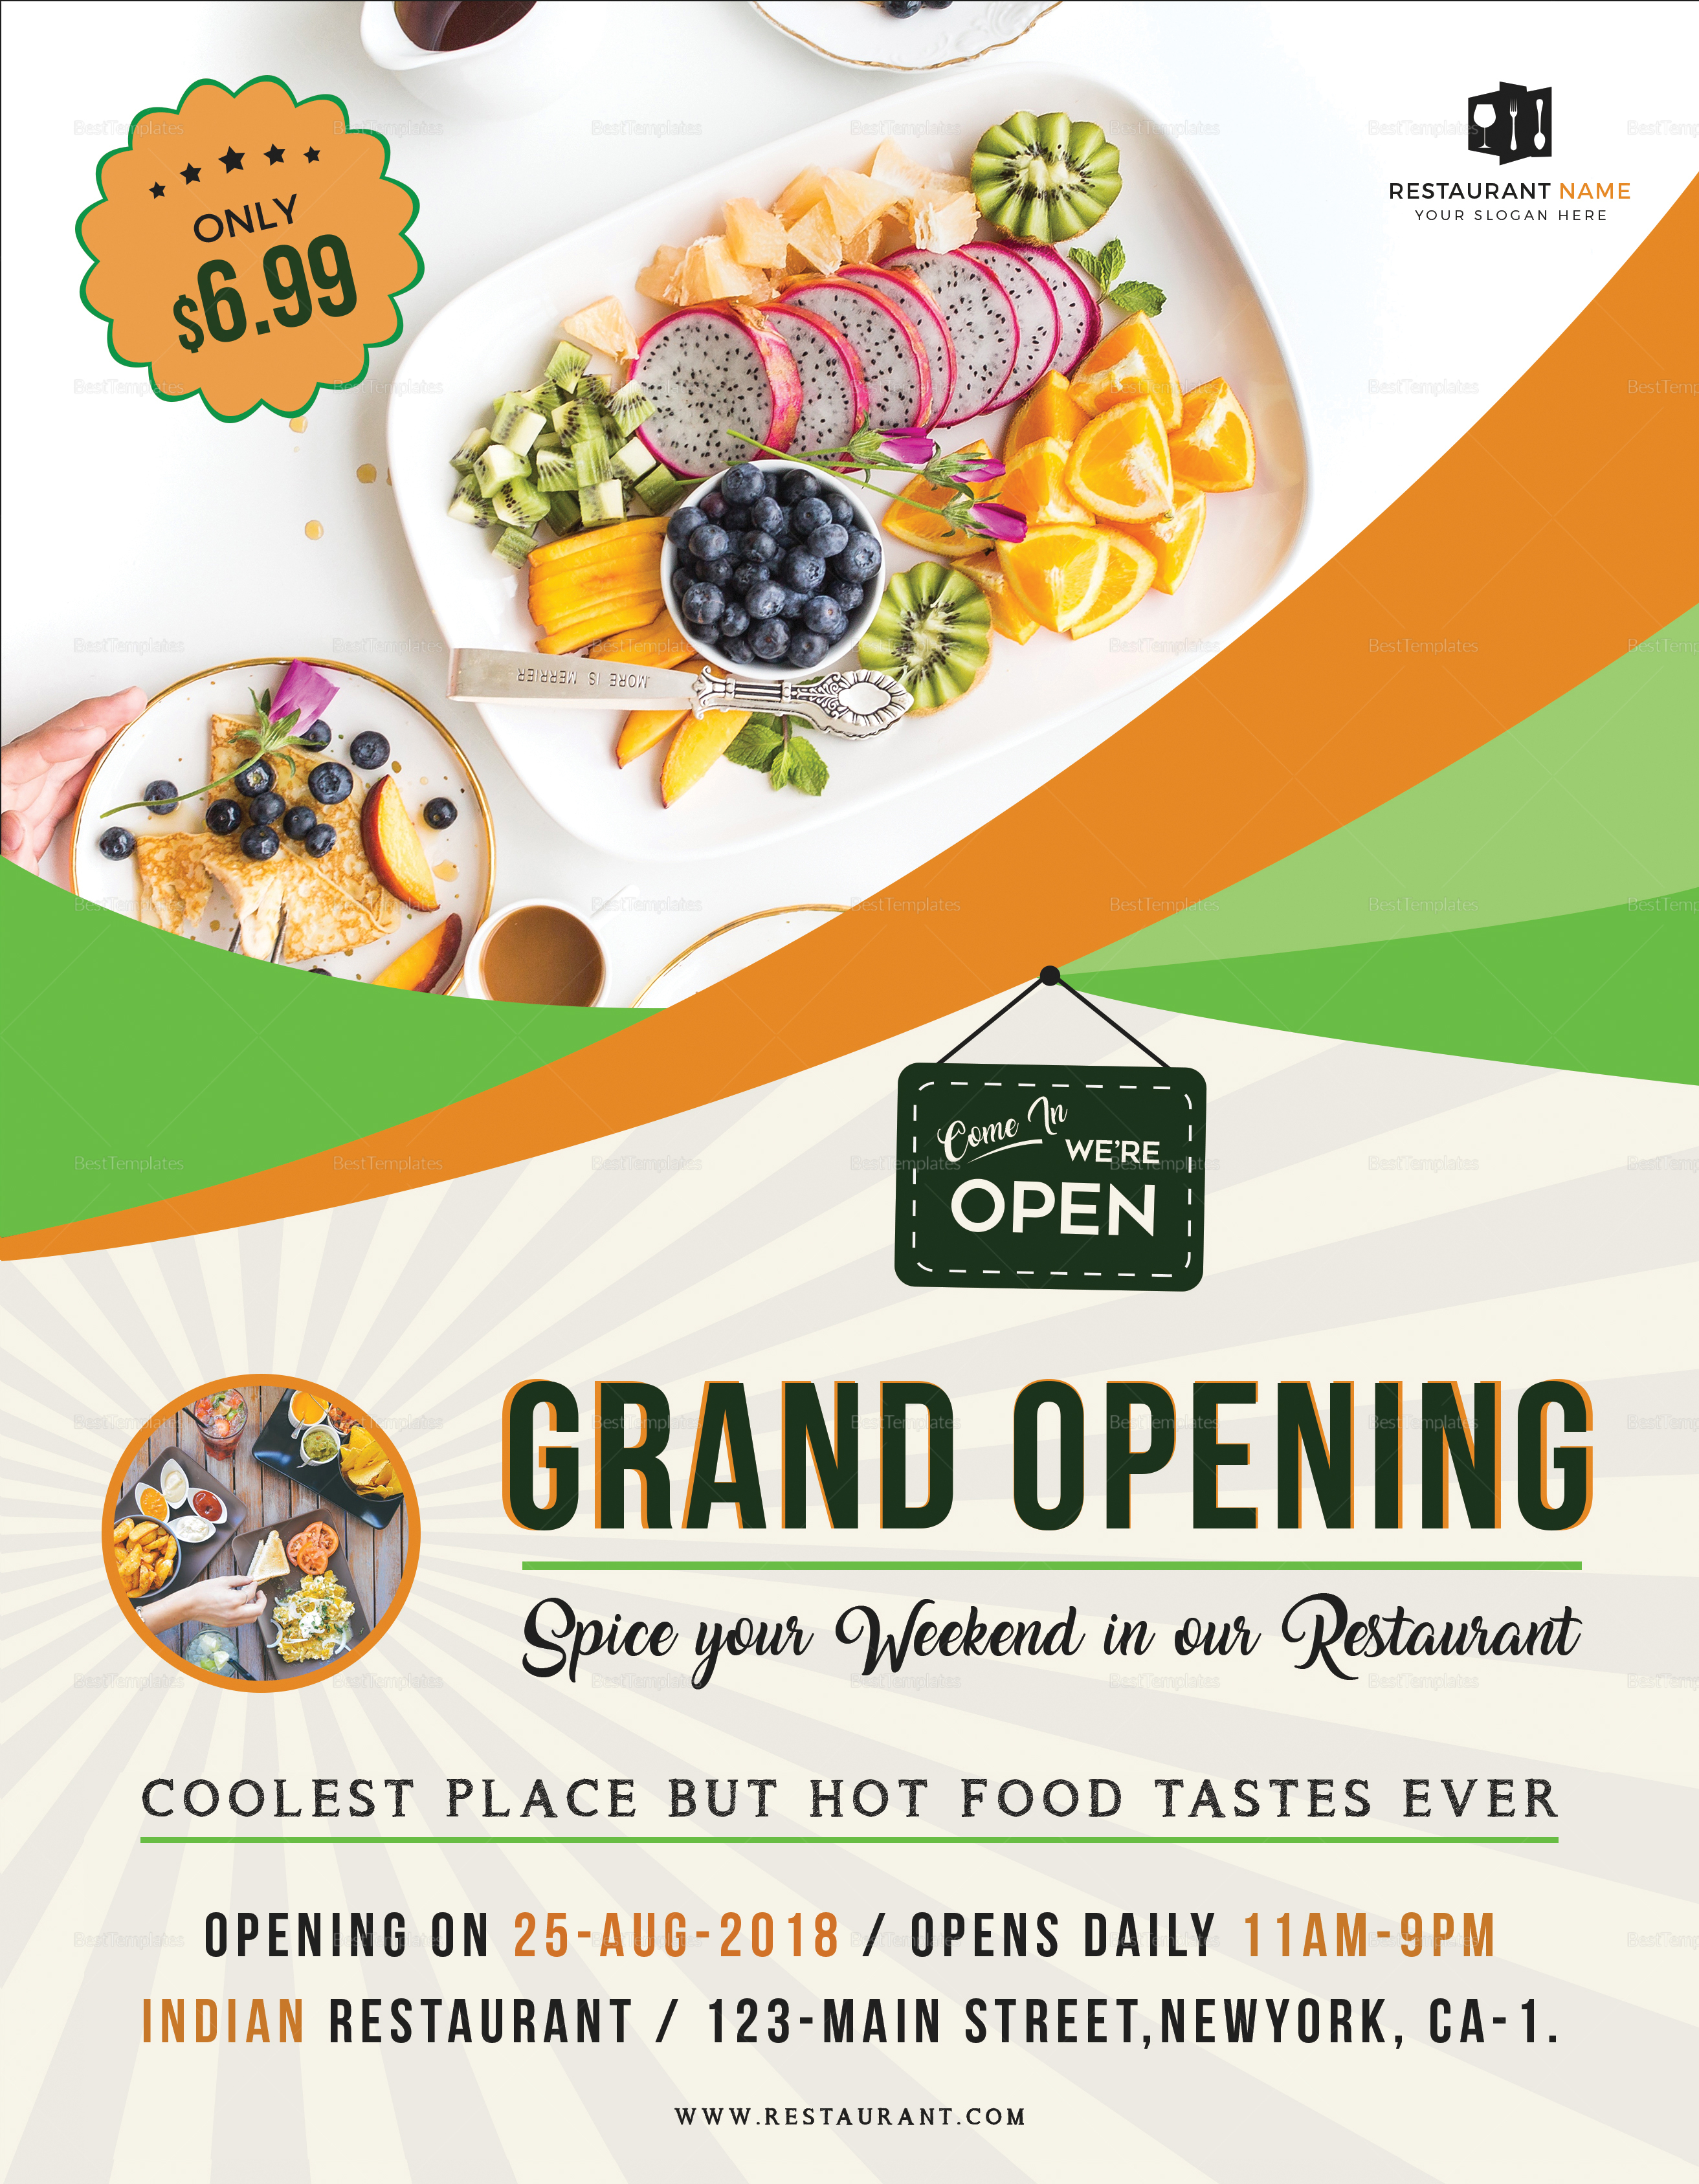 restaurant grand opening flyer design template in word